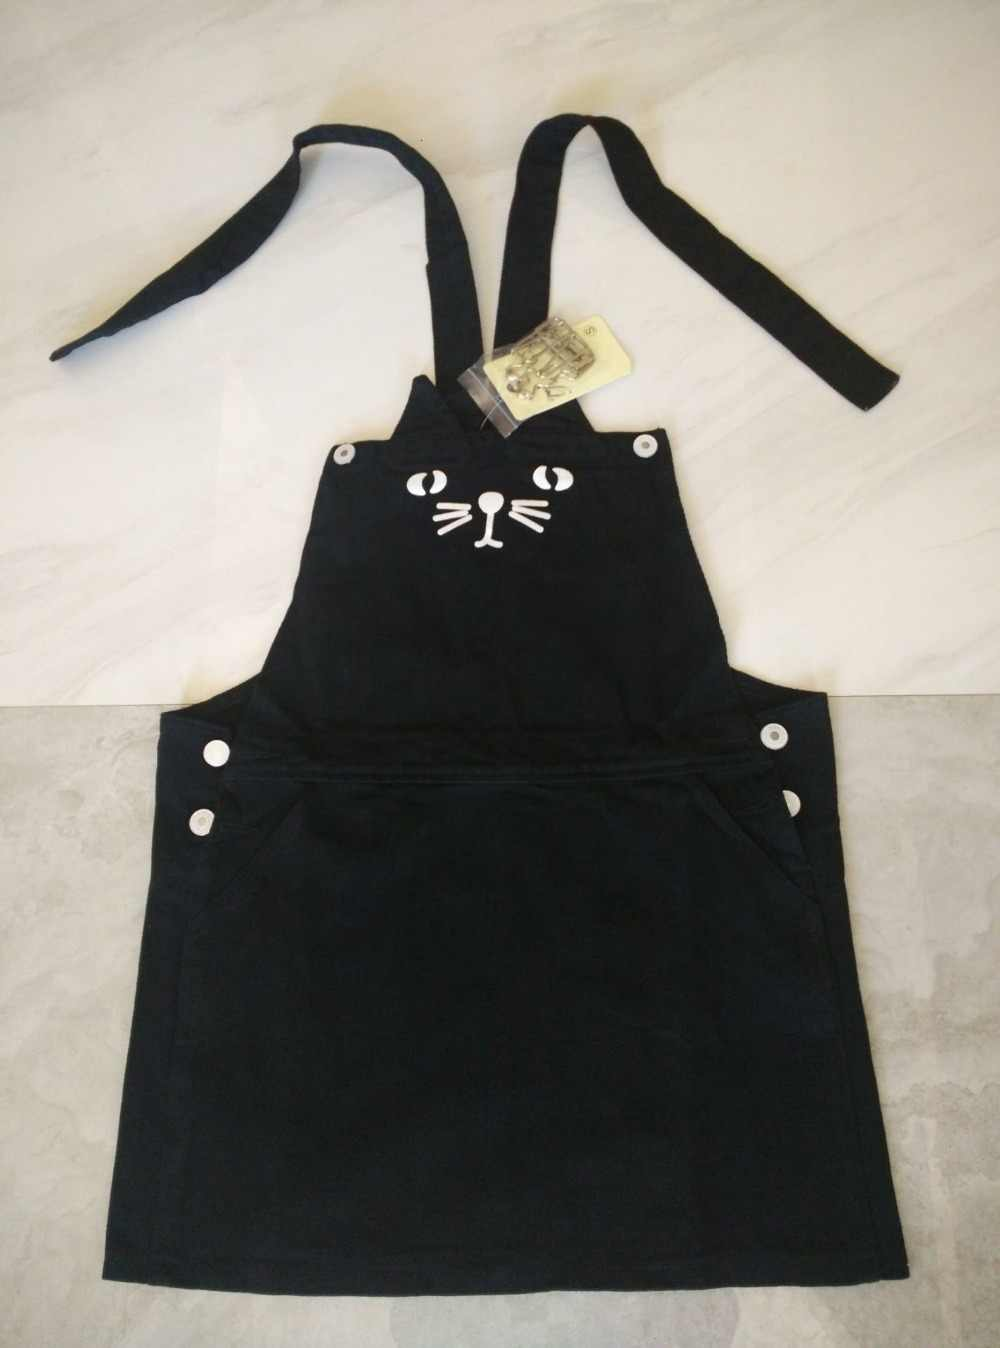 5cd058ce8b ... 2019 Kawaii Women Cute Cat Suspender Denim Dress Loose Jeans Preppy  Style Sundress Overall Romper Playsuit ...